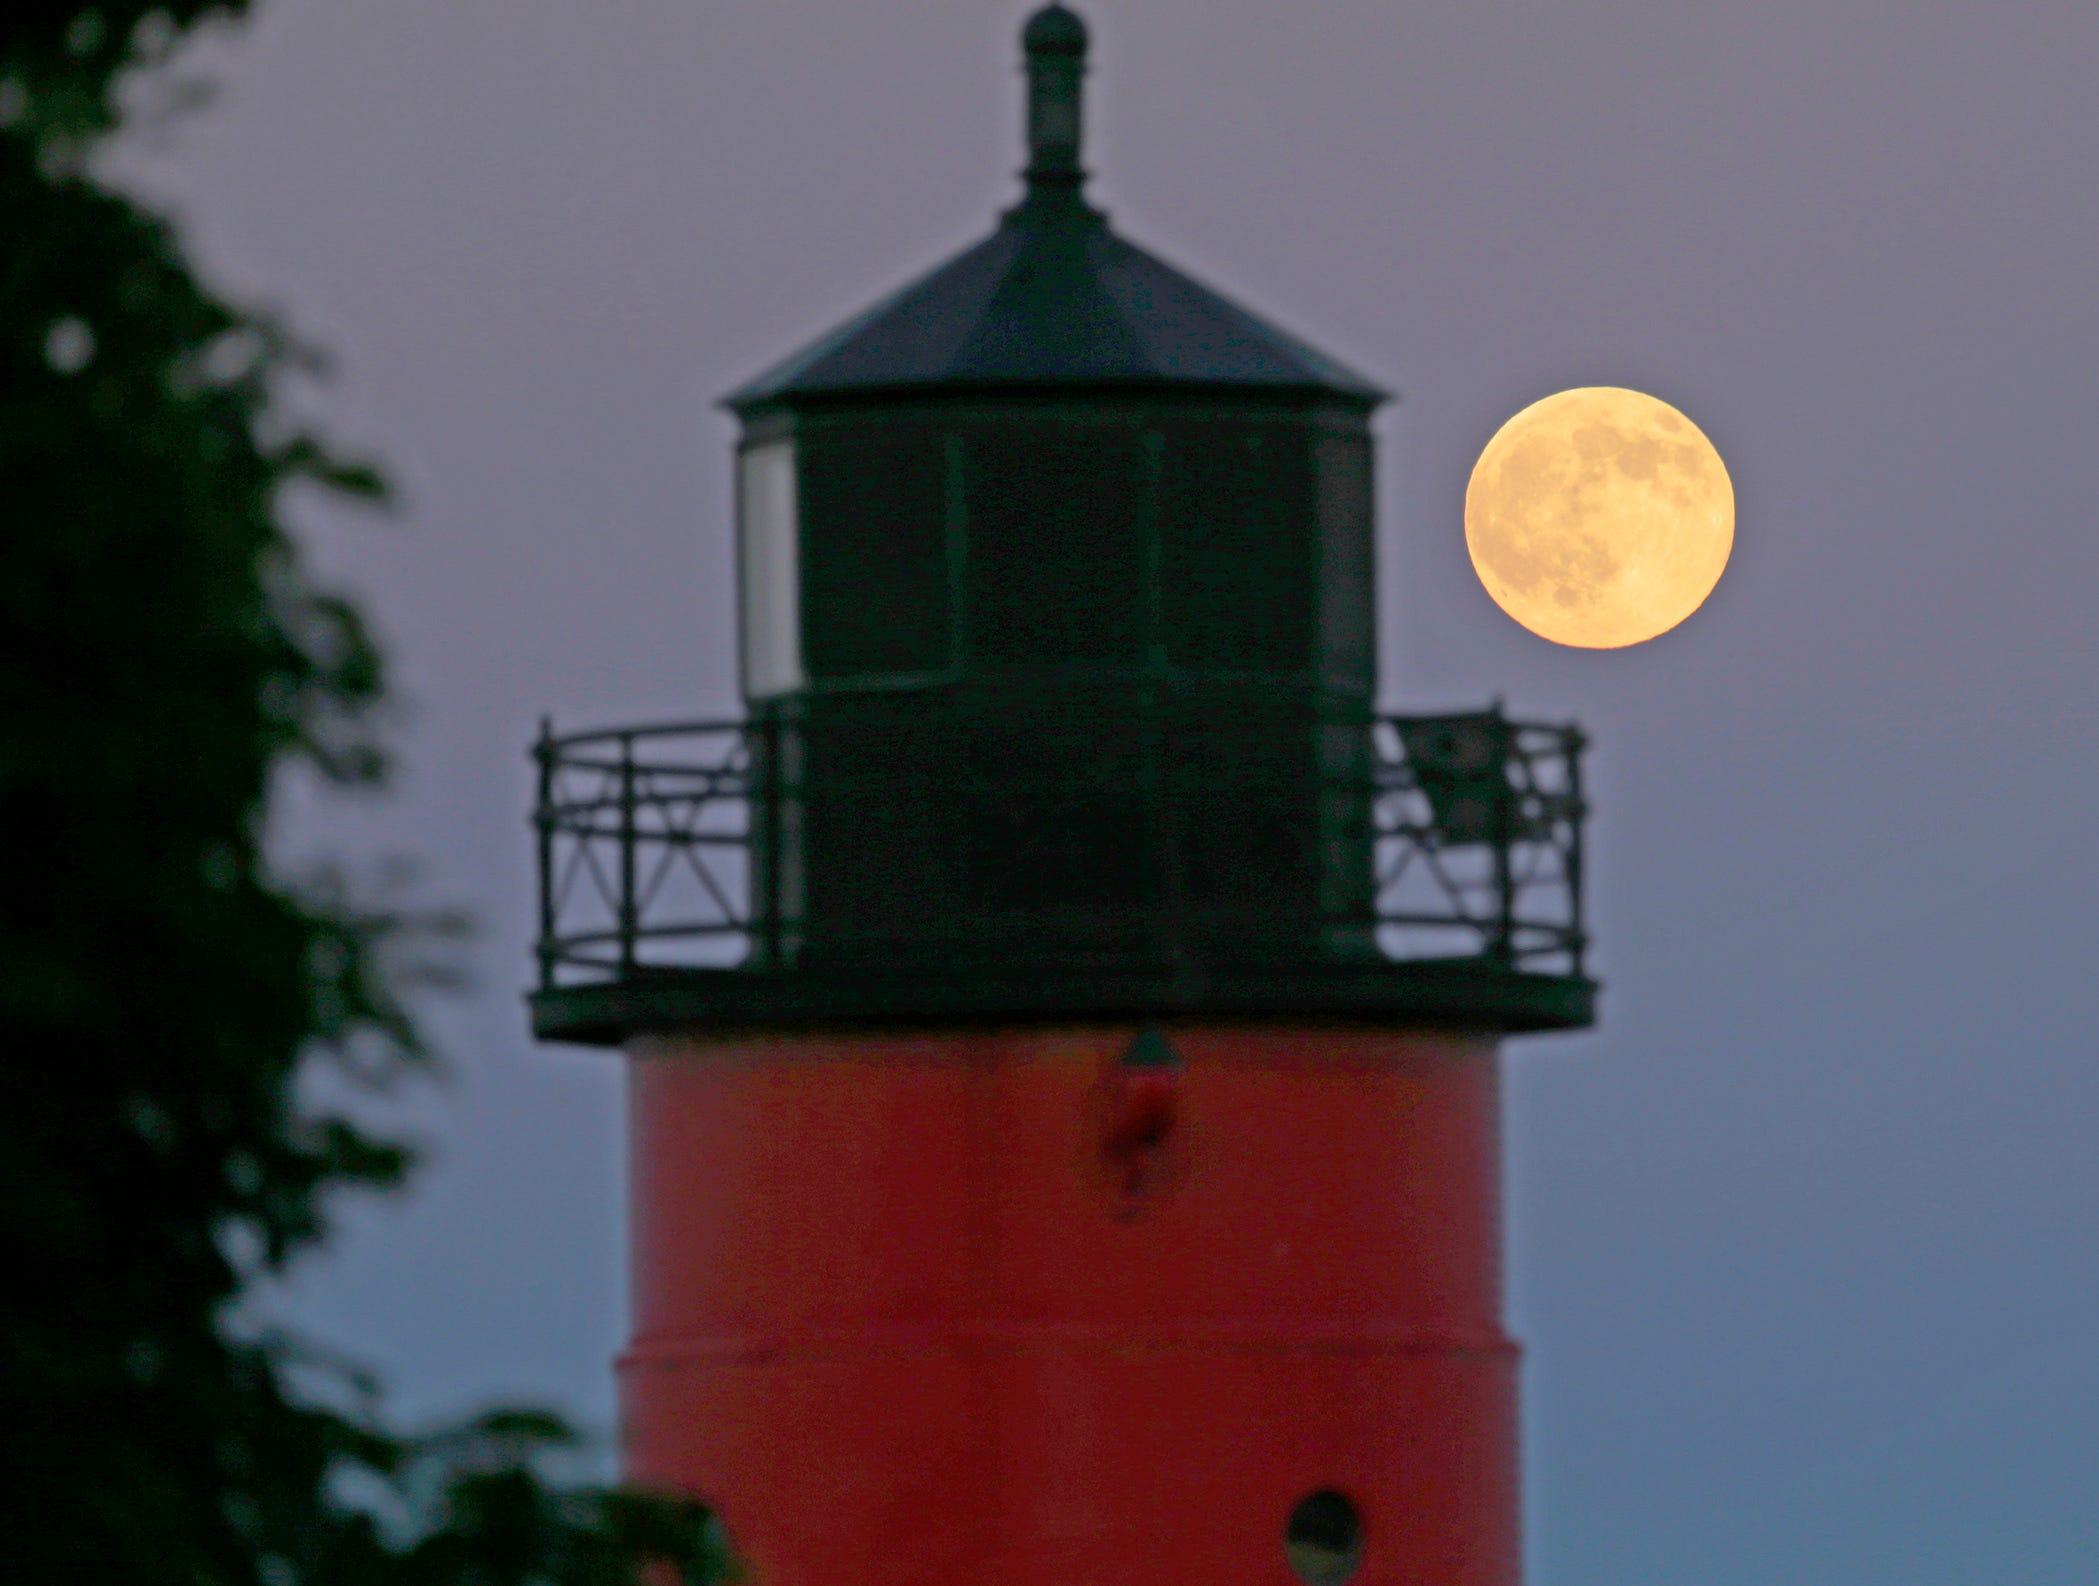 The moon rises near the Milwaukee Pierhead Light off the Summerfest grounds on July 9, 2017.